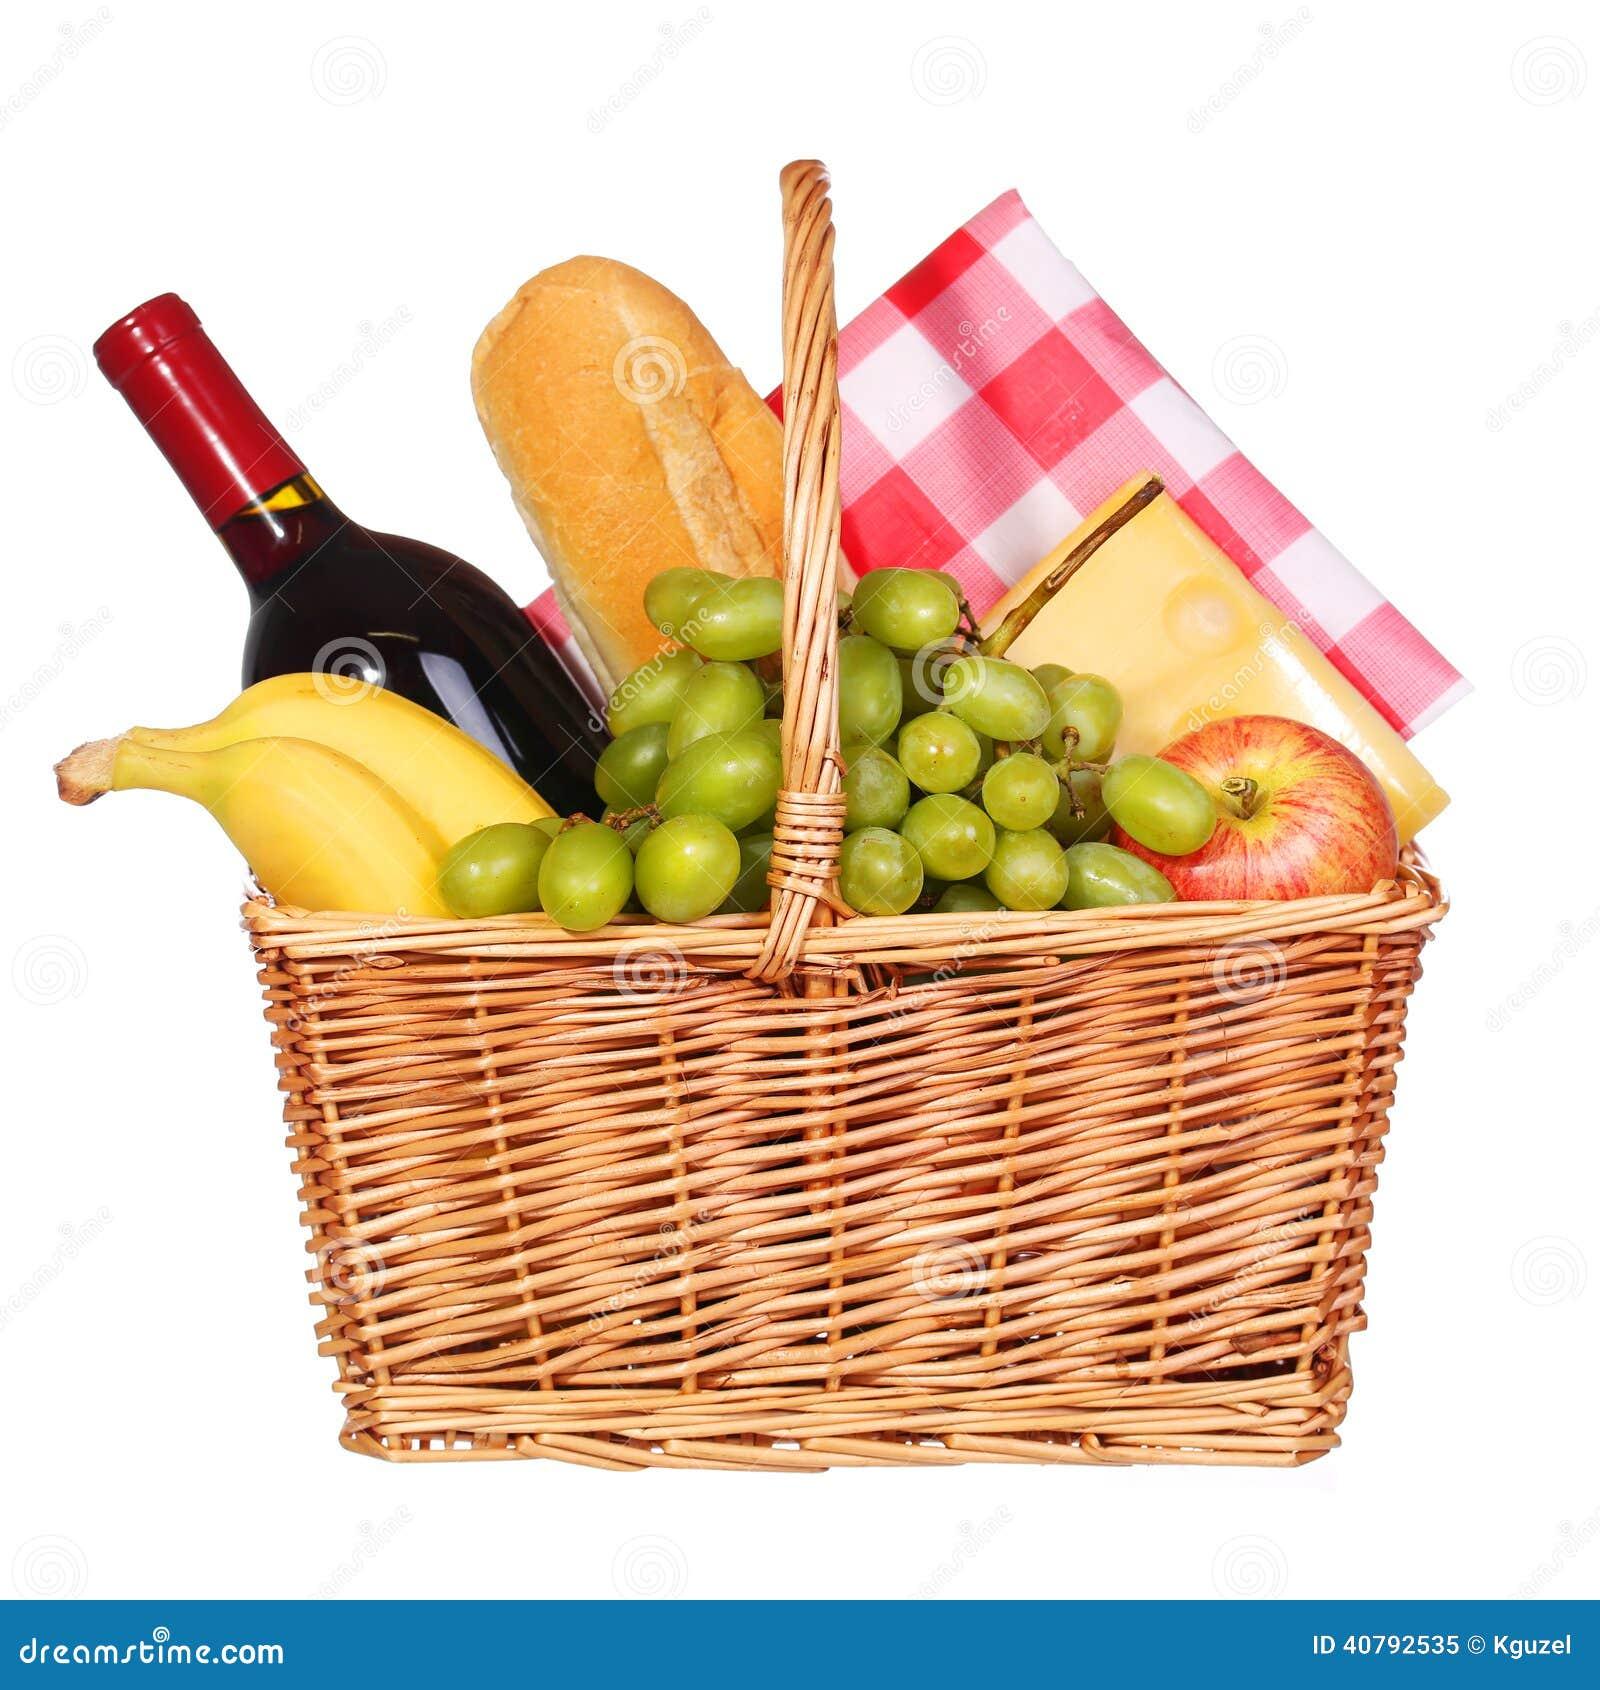 Picnic Basket Food : Picnic basket with food isolated stock photo image